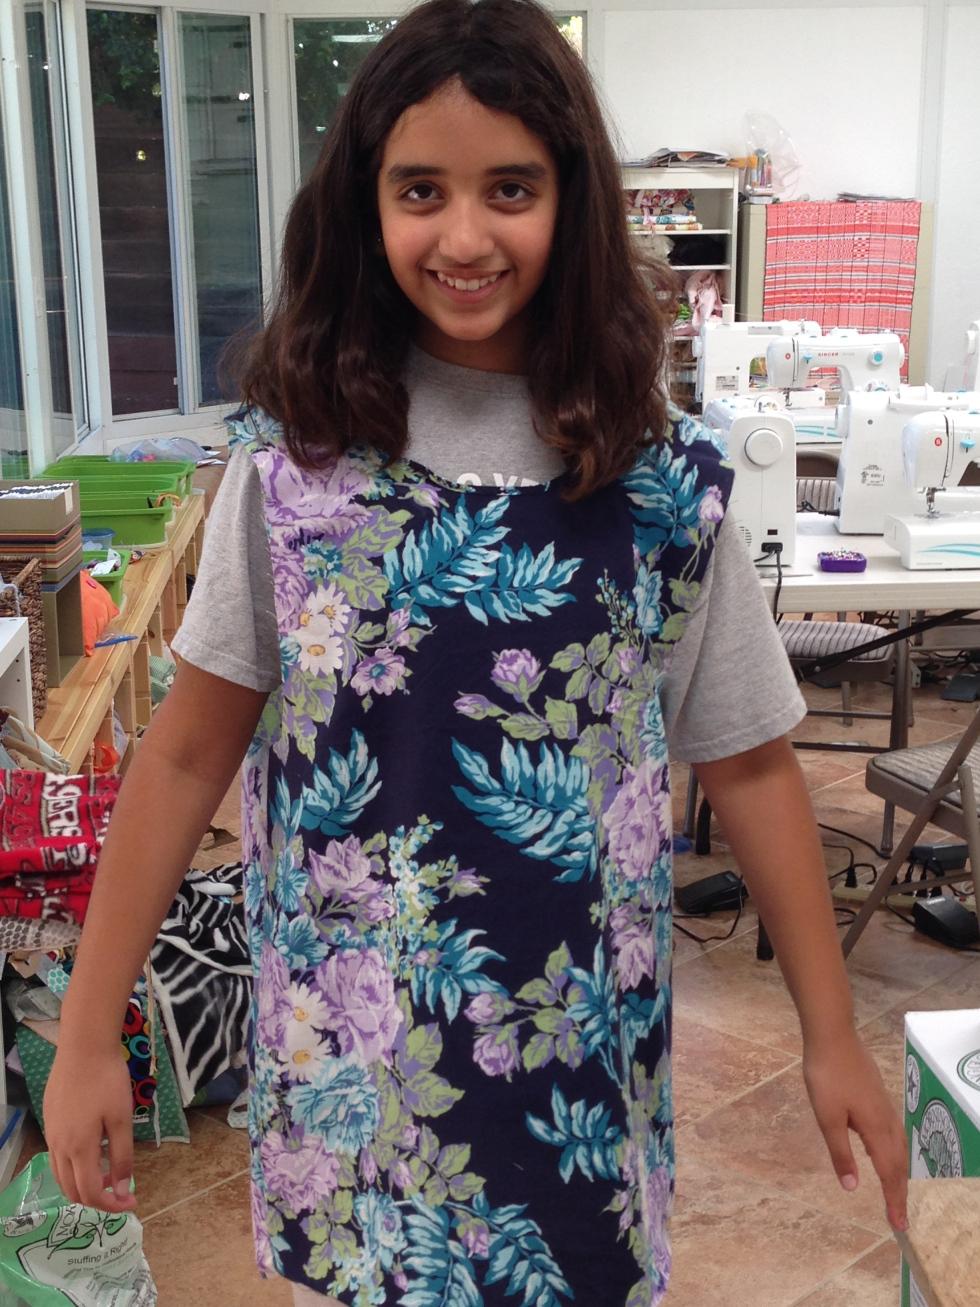 6th grader self-designed shirt